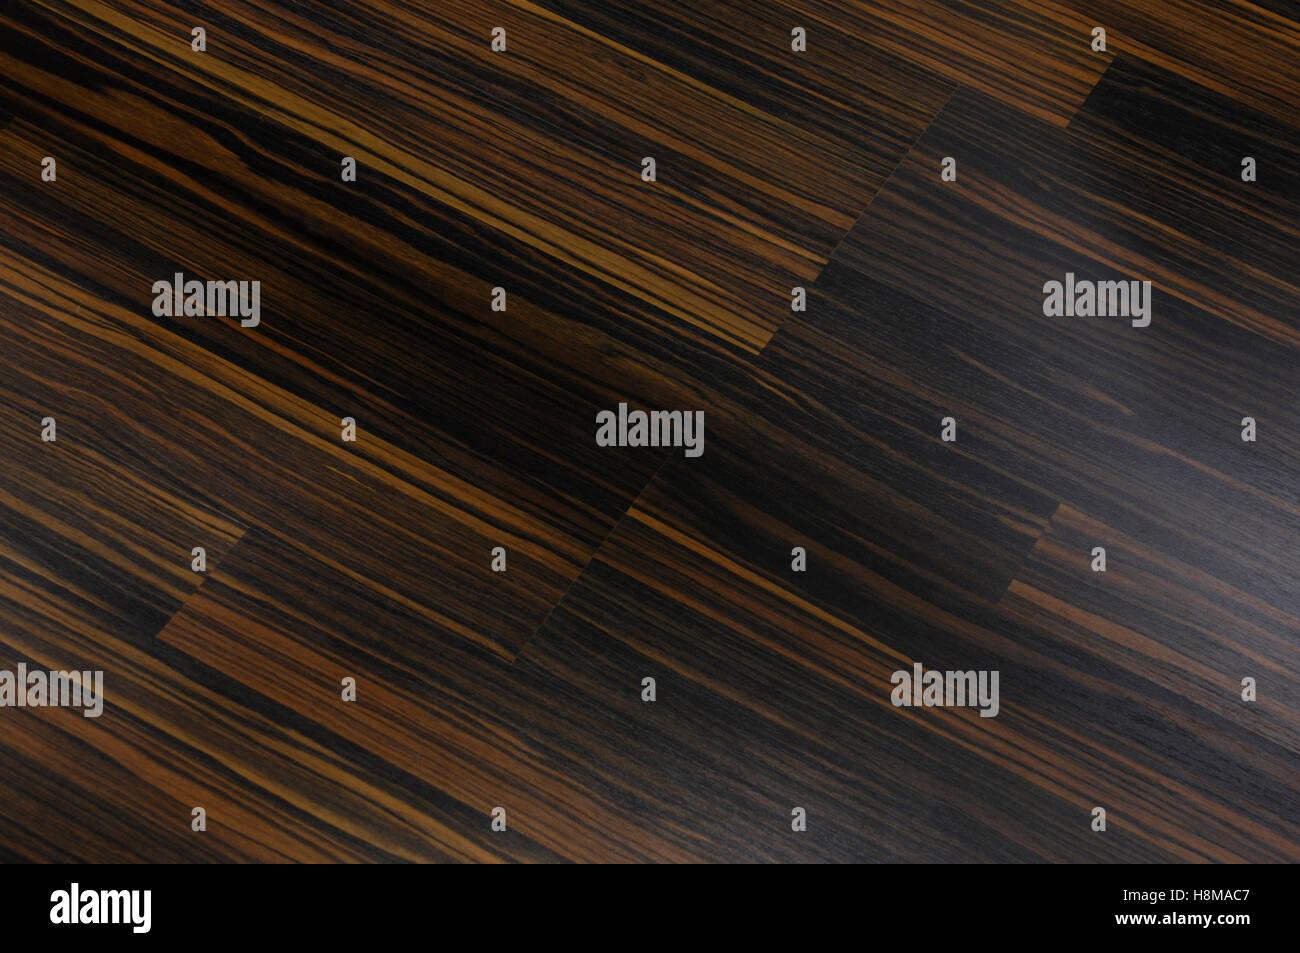 Dark brown wood laminated floor, background - Stock Image